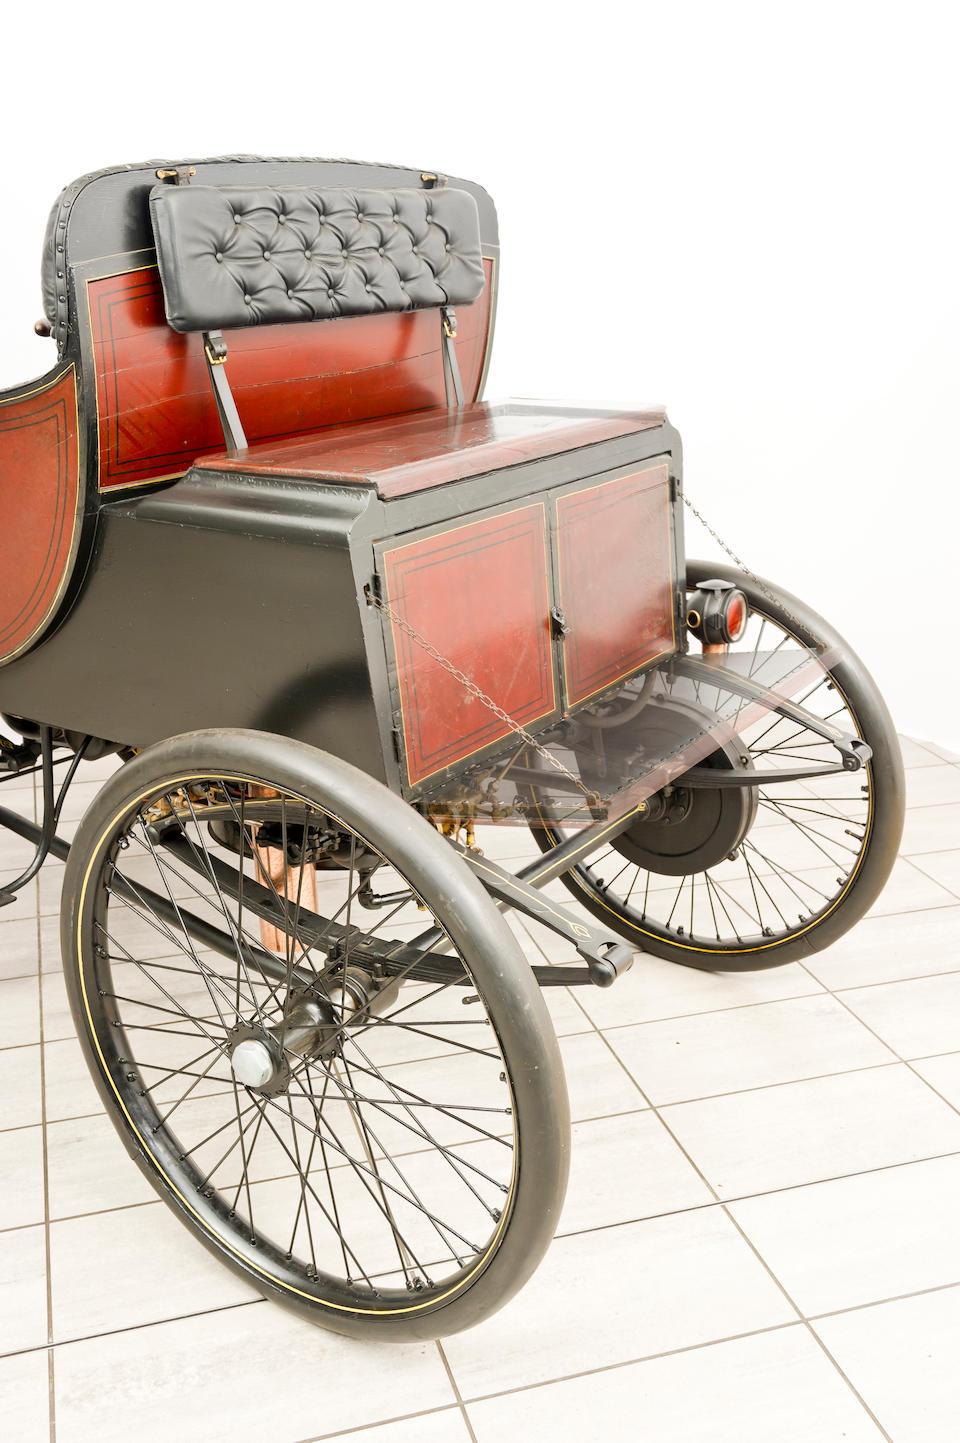 c.1897 Hart Steam Victoria Four-Seater Dos-à-Dos